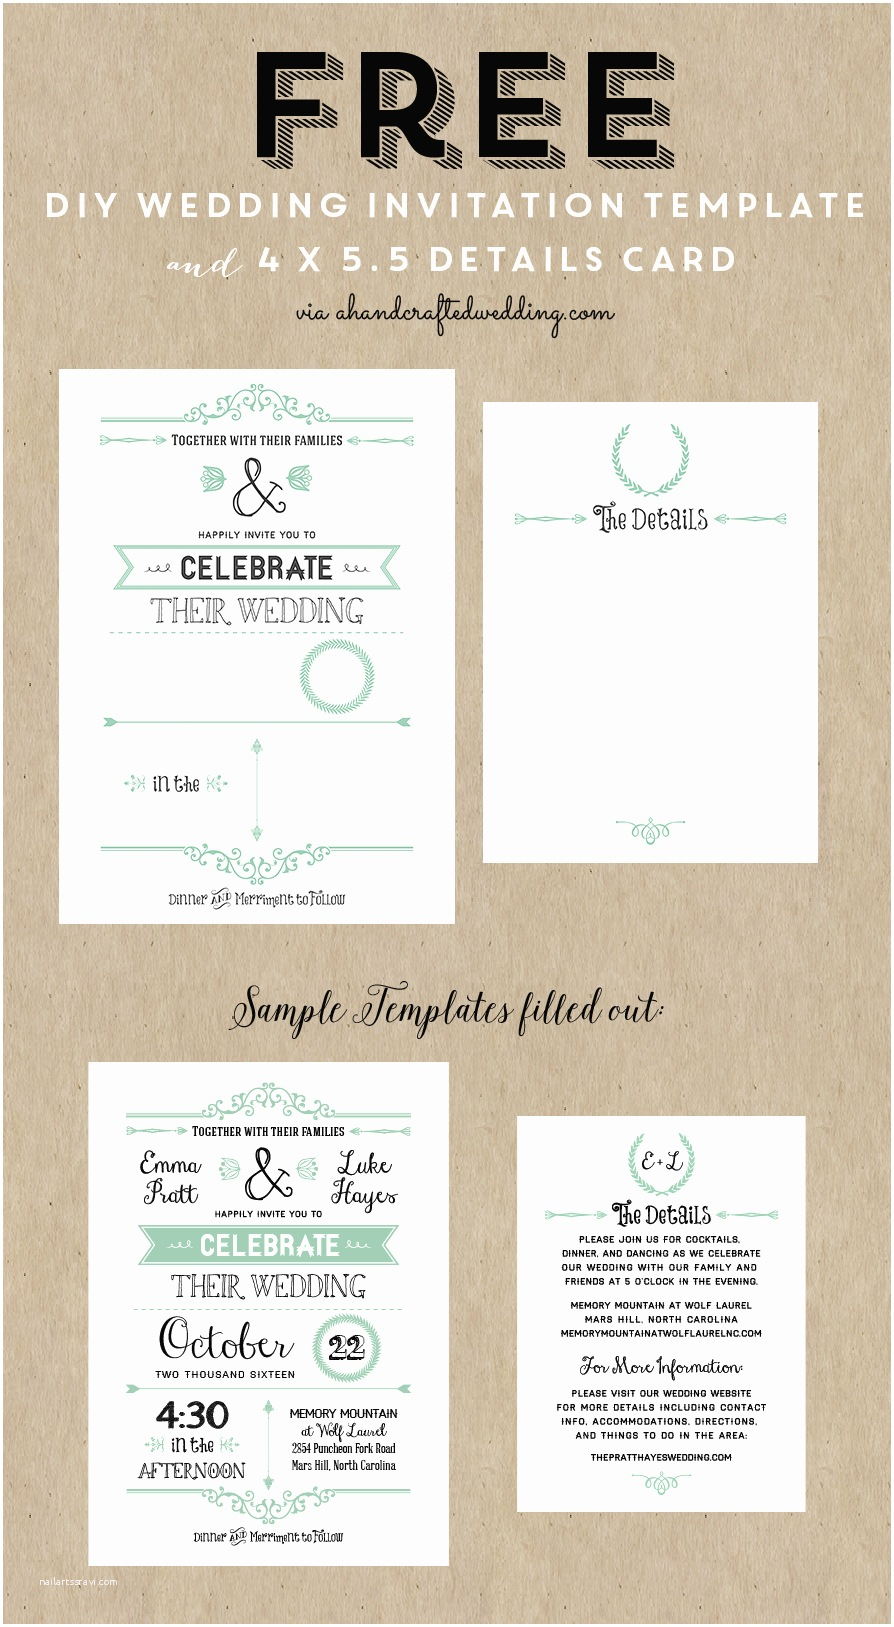 Amazing Wedding Invitations Amazing Diy Printable Wedding Invitations To Inspire